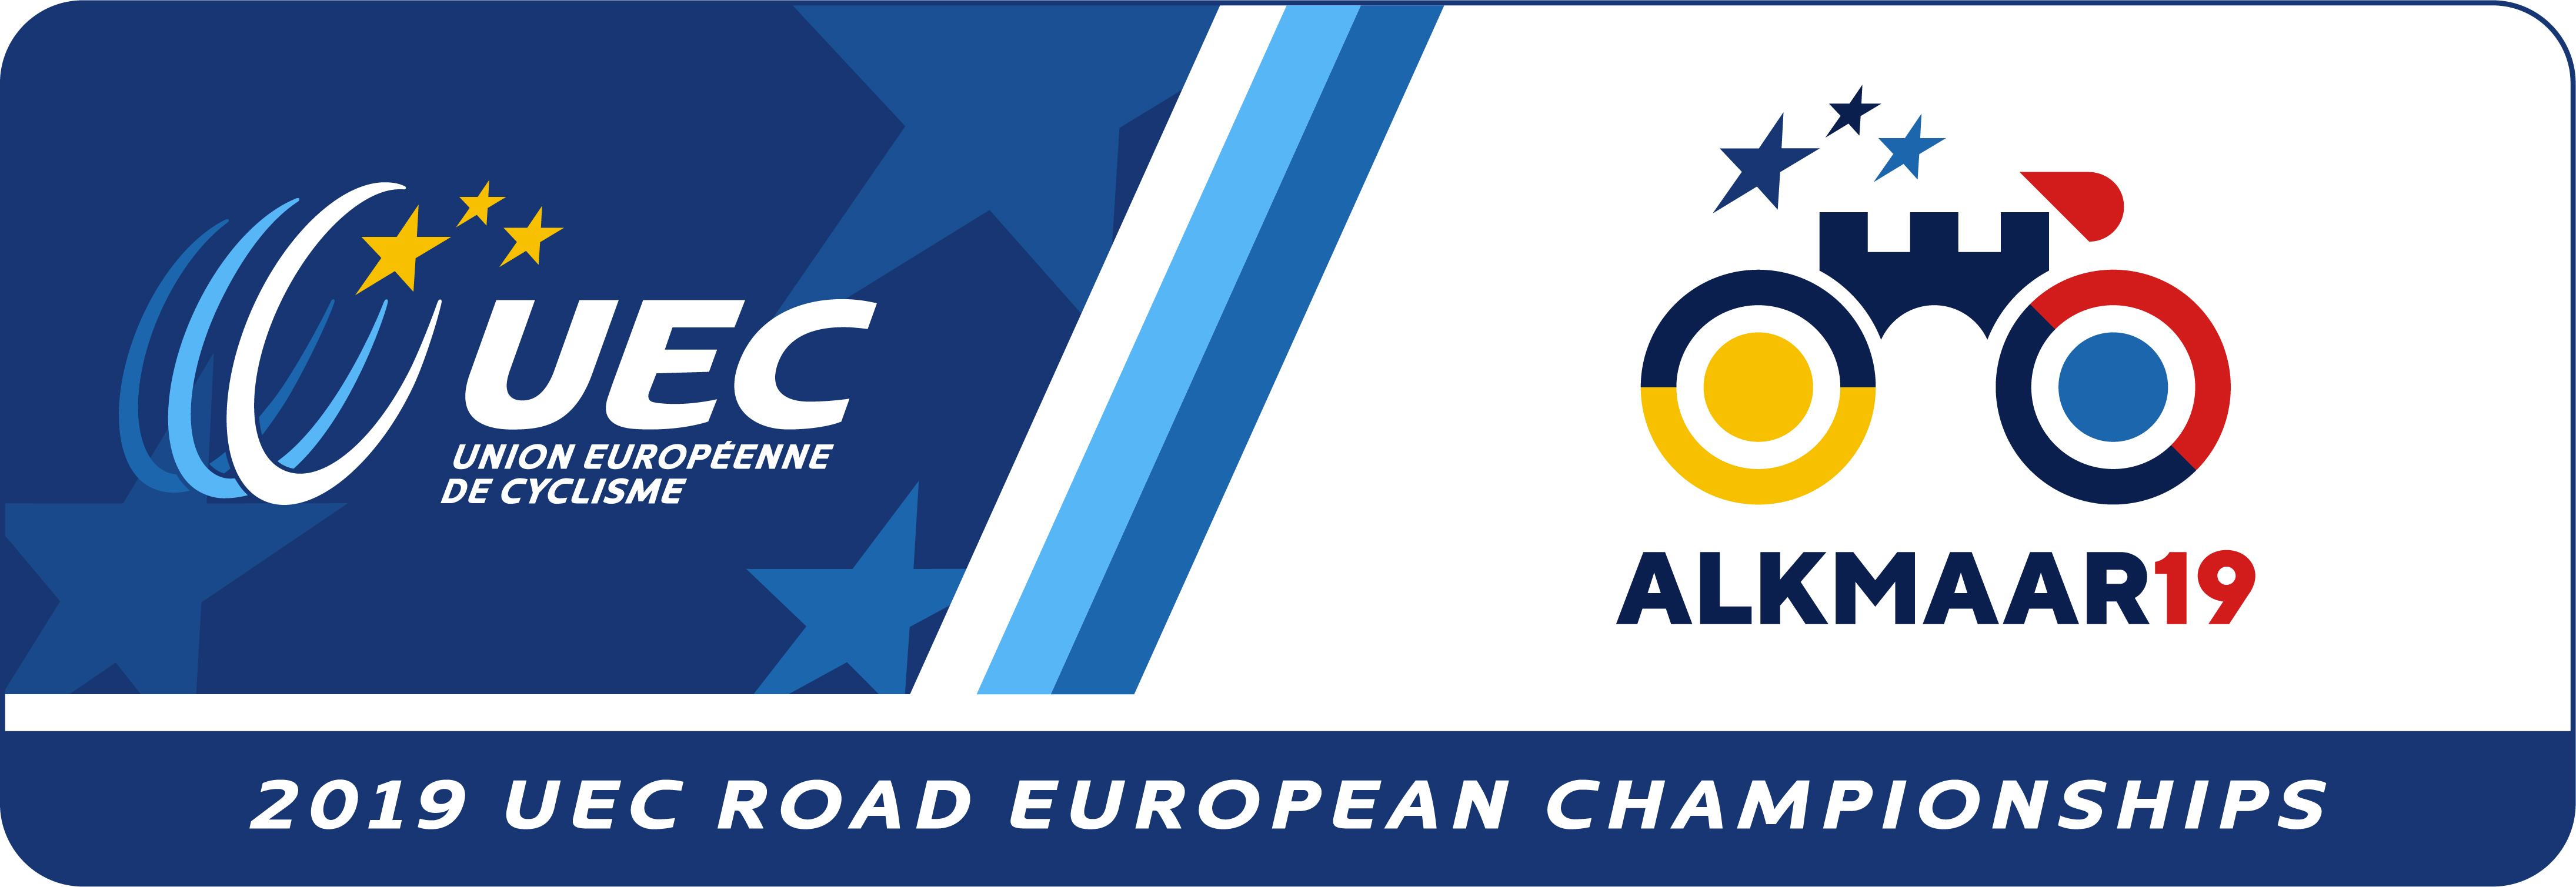 321096 uec alkmaar19 event box logo rgb ffb1ef original 1561713151